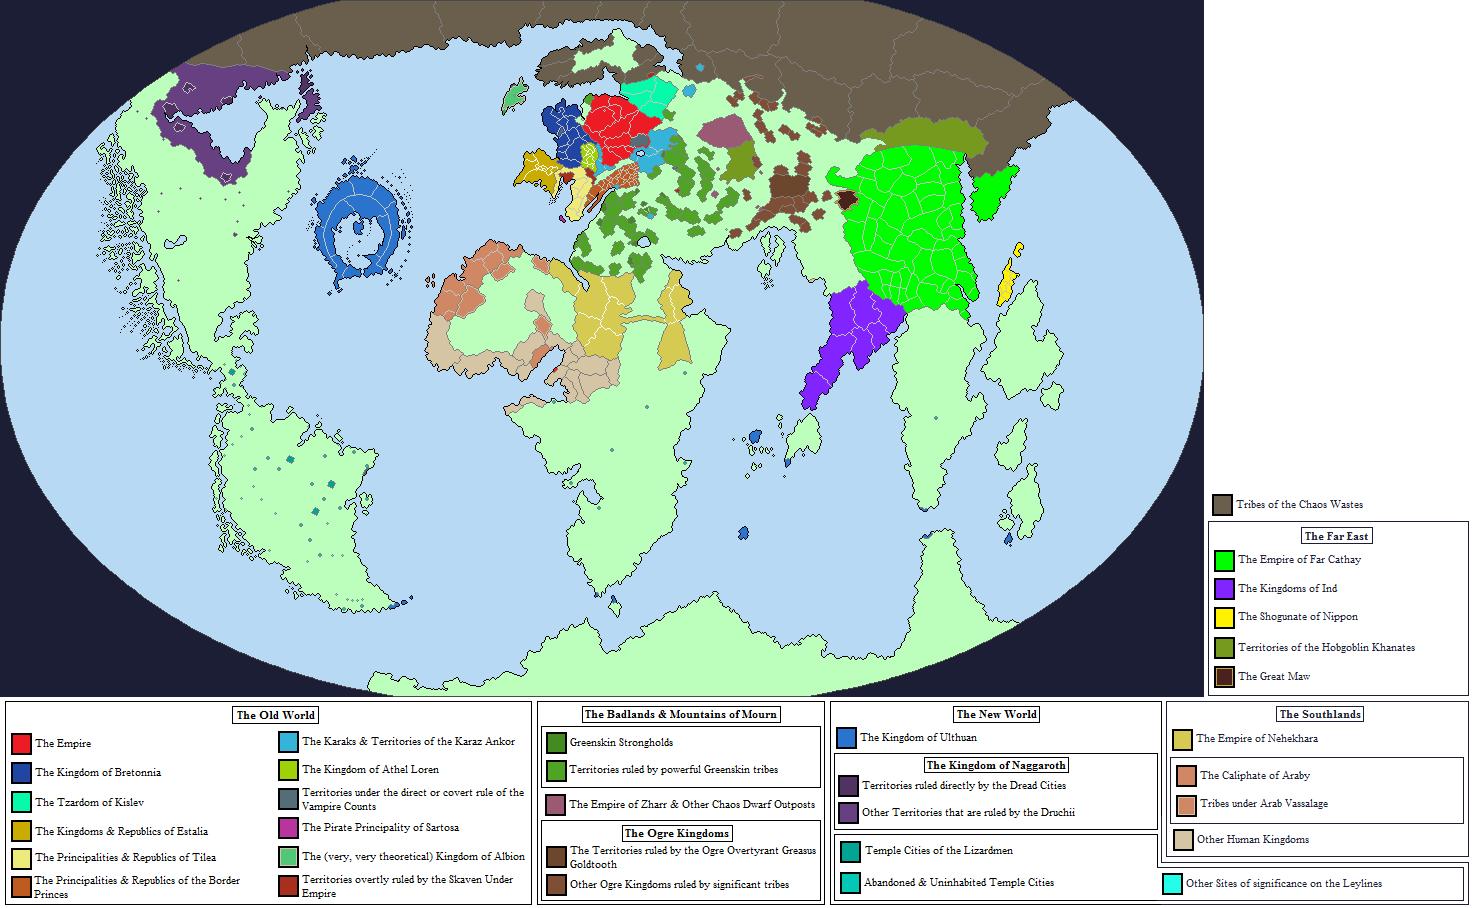 Warhammer world map by zanzibar with nations by royalpsycho on warhammer world map by zanzibar with nations by royalpsycho gumiabroncs Gallery